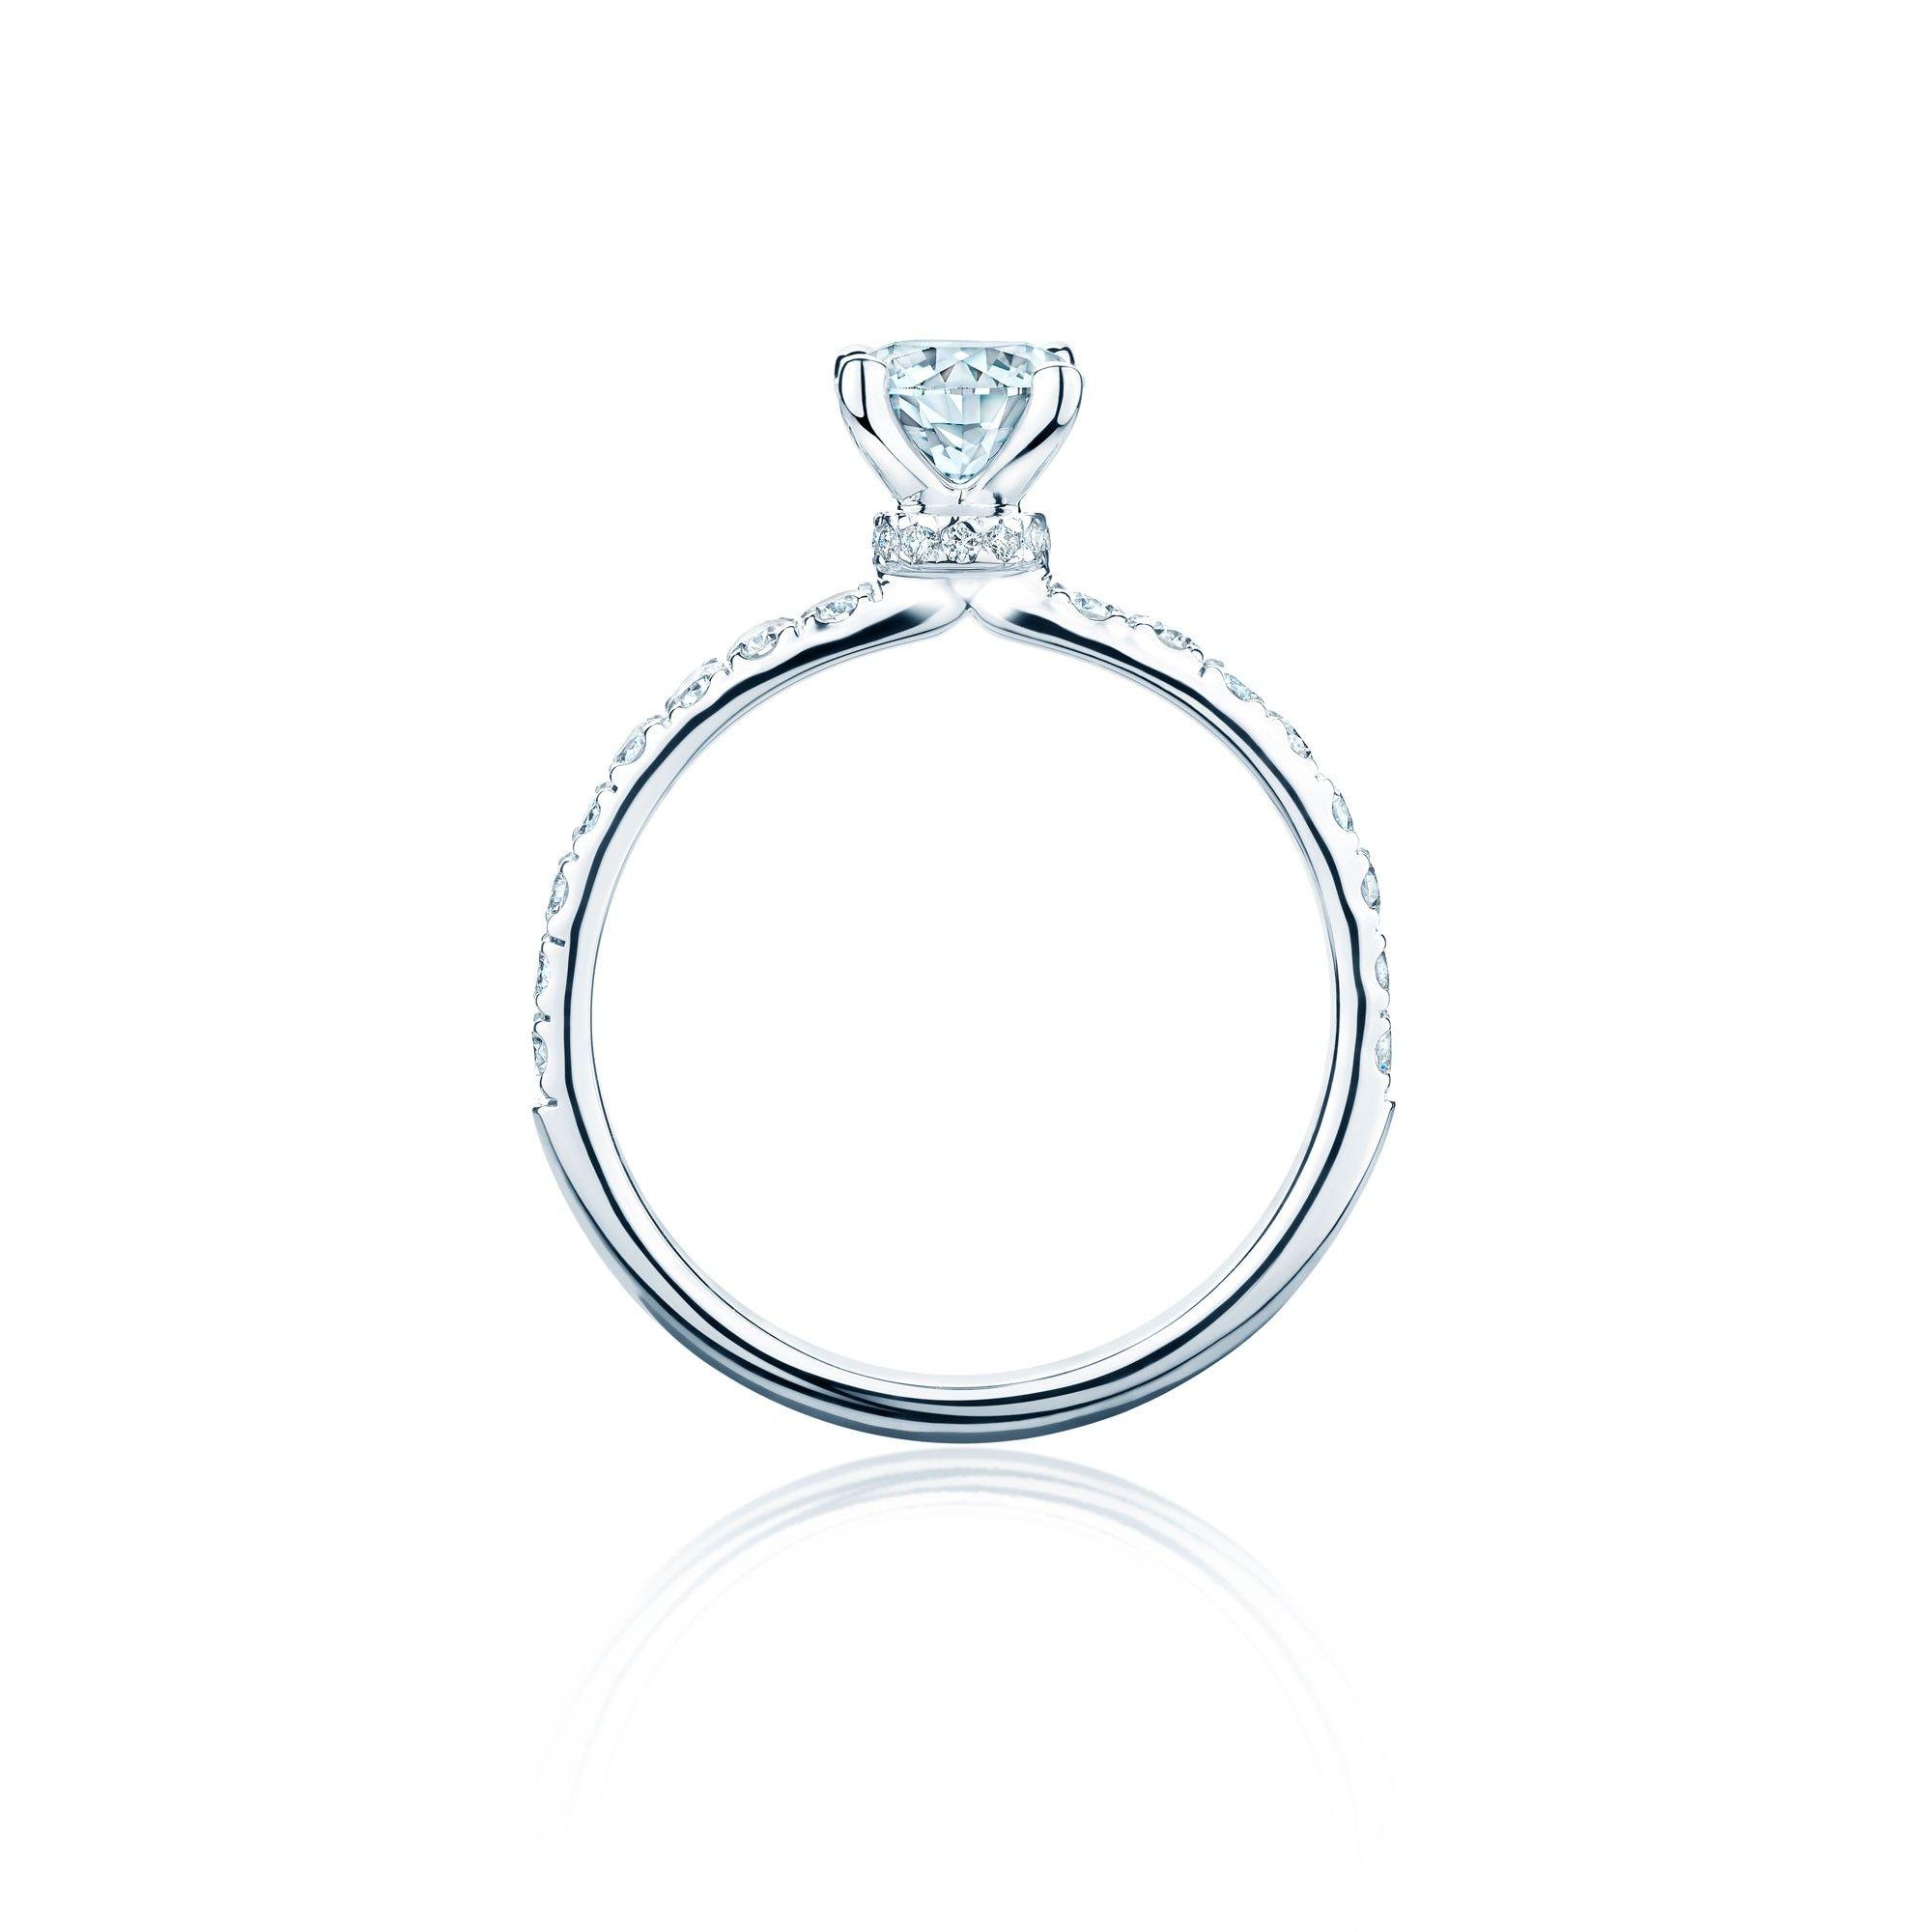 BIRKS DECO Canadian diamond pavé engagement ring